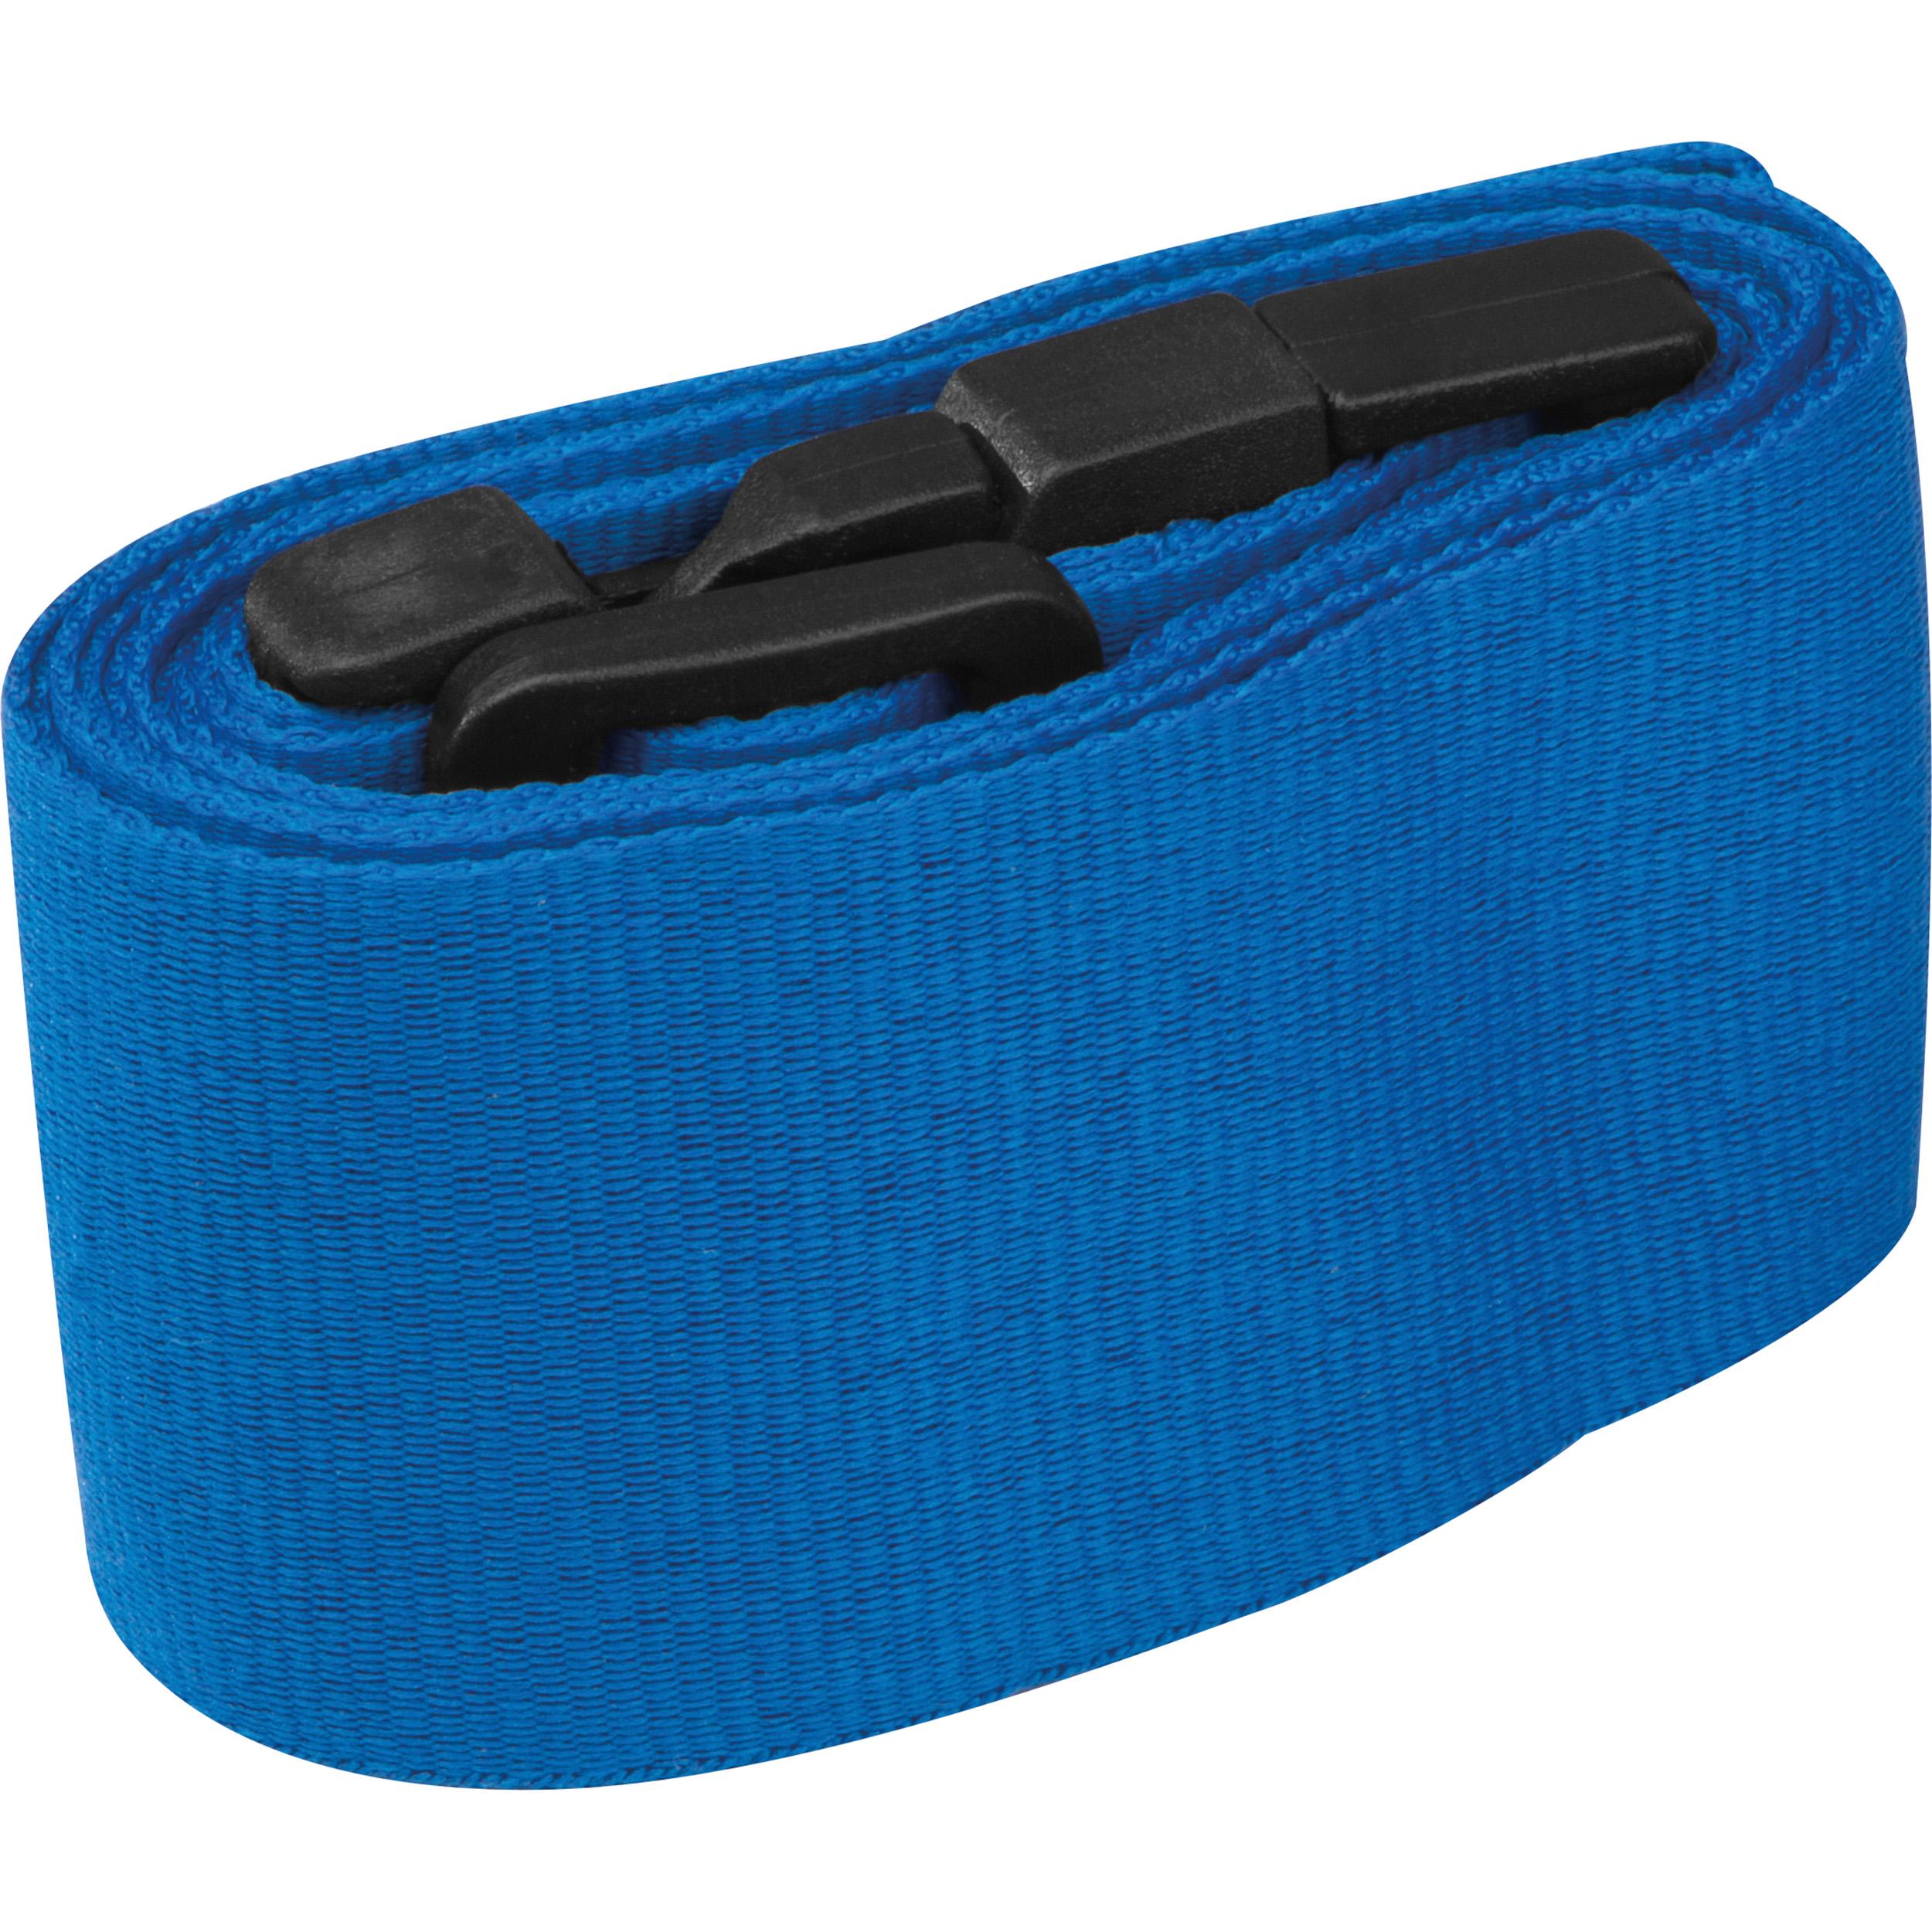 Adjustable luggage strap